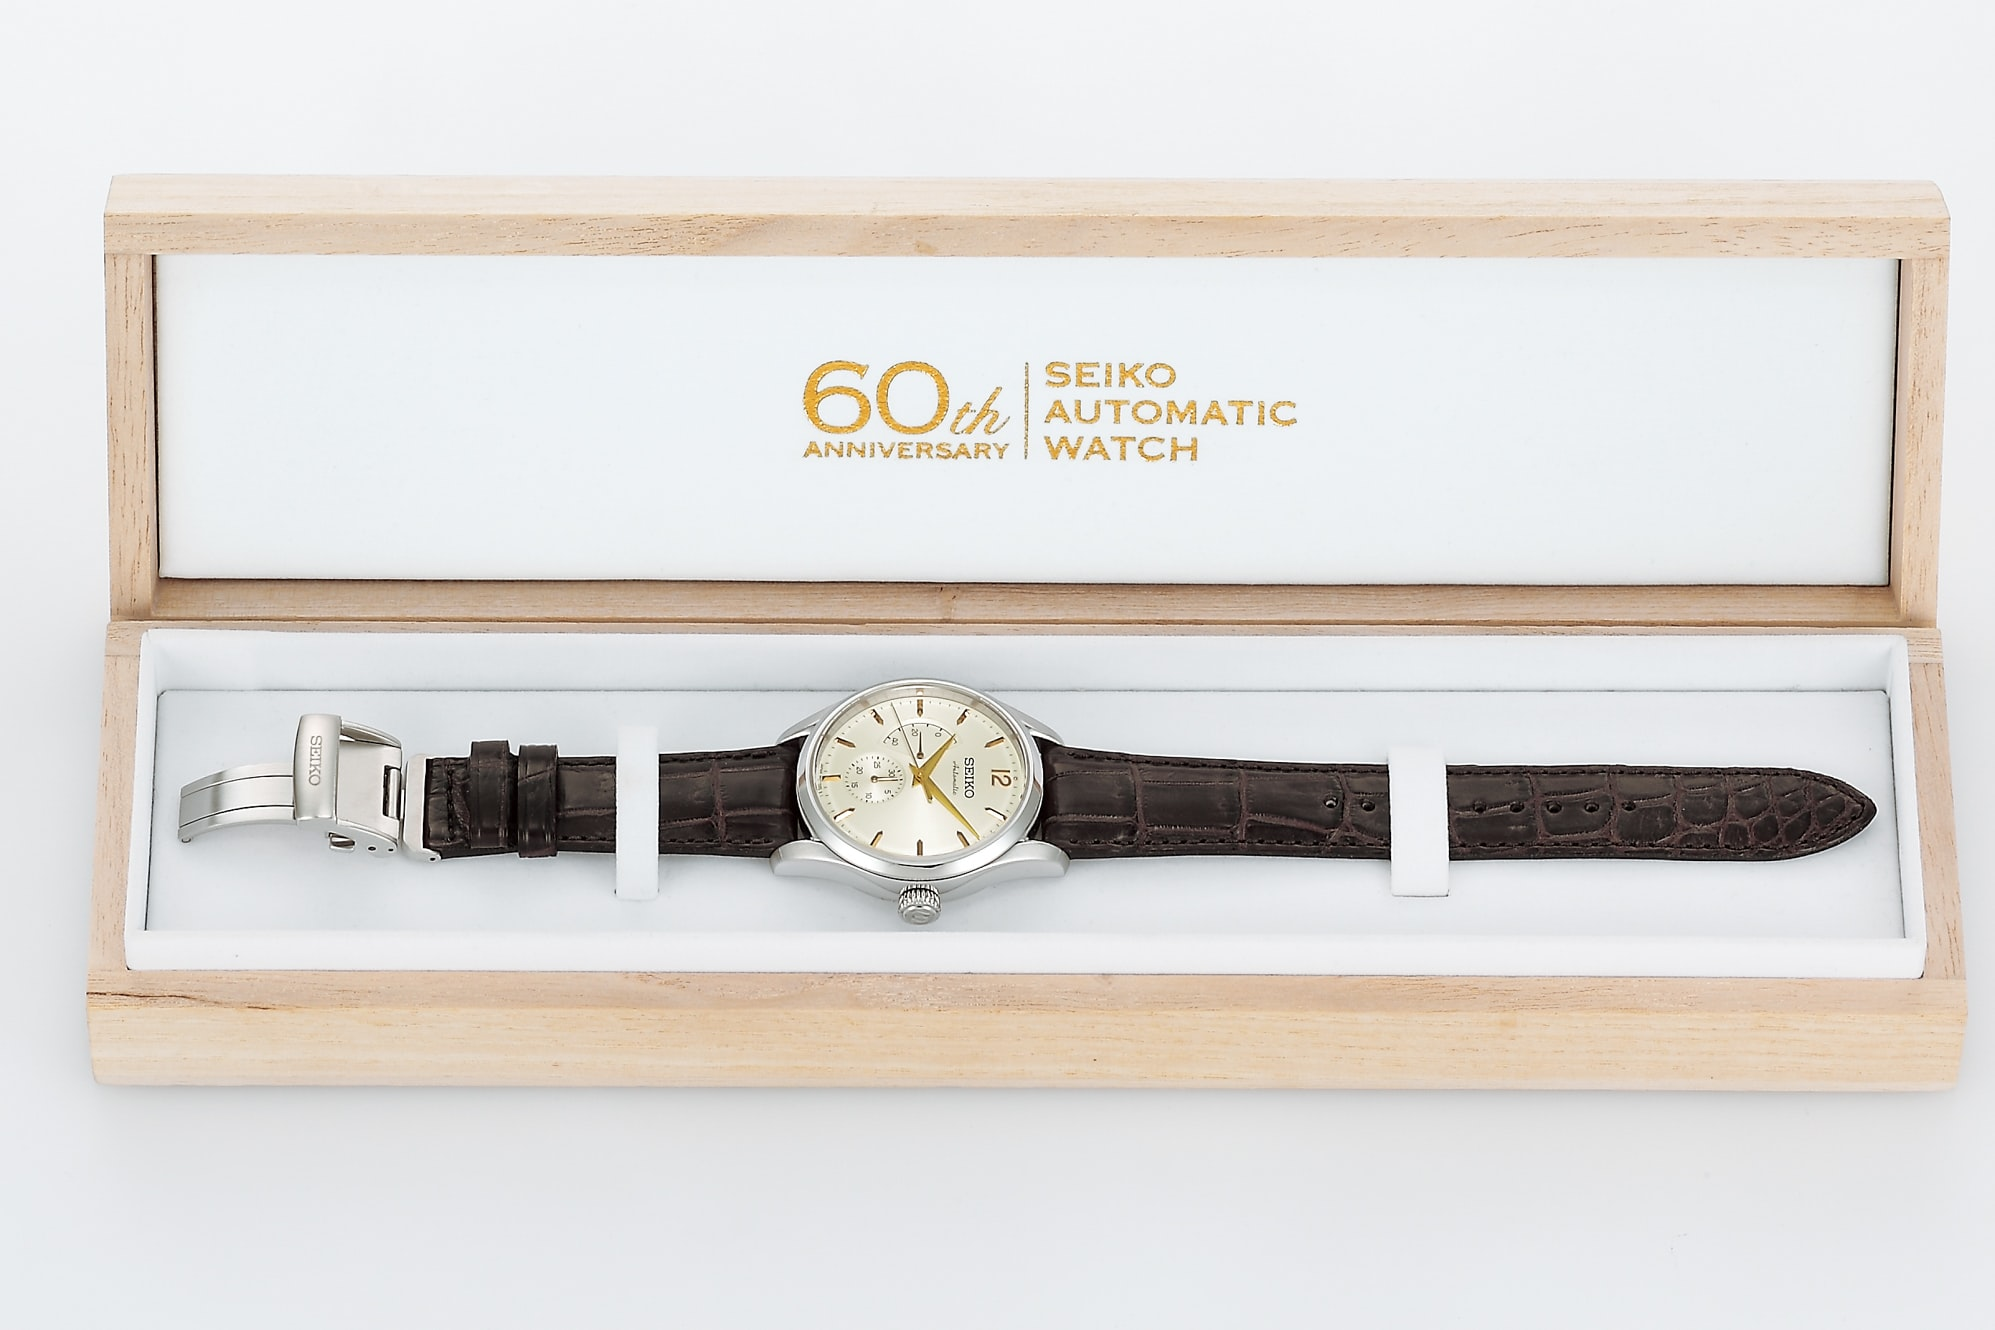 Seiko Presage Automatic 60th Anniversary Limited Edition, SARW027 box Introducing: The Seiko Presage Automatic 60th Anniversary Limited Edition, SARW027 Introducing: The Seiko Presage Automatic 60th Anniversary Limited Edition, SARW027 SARW027 box